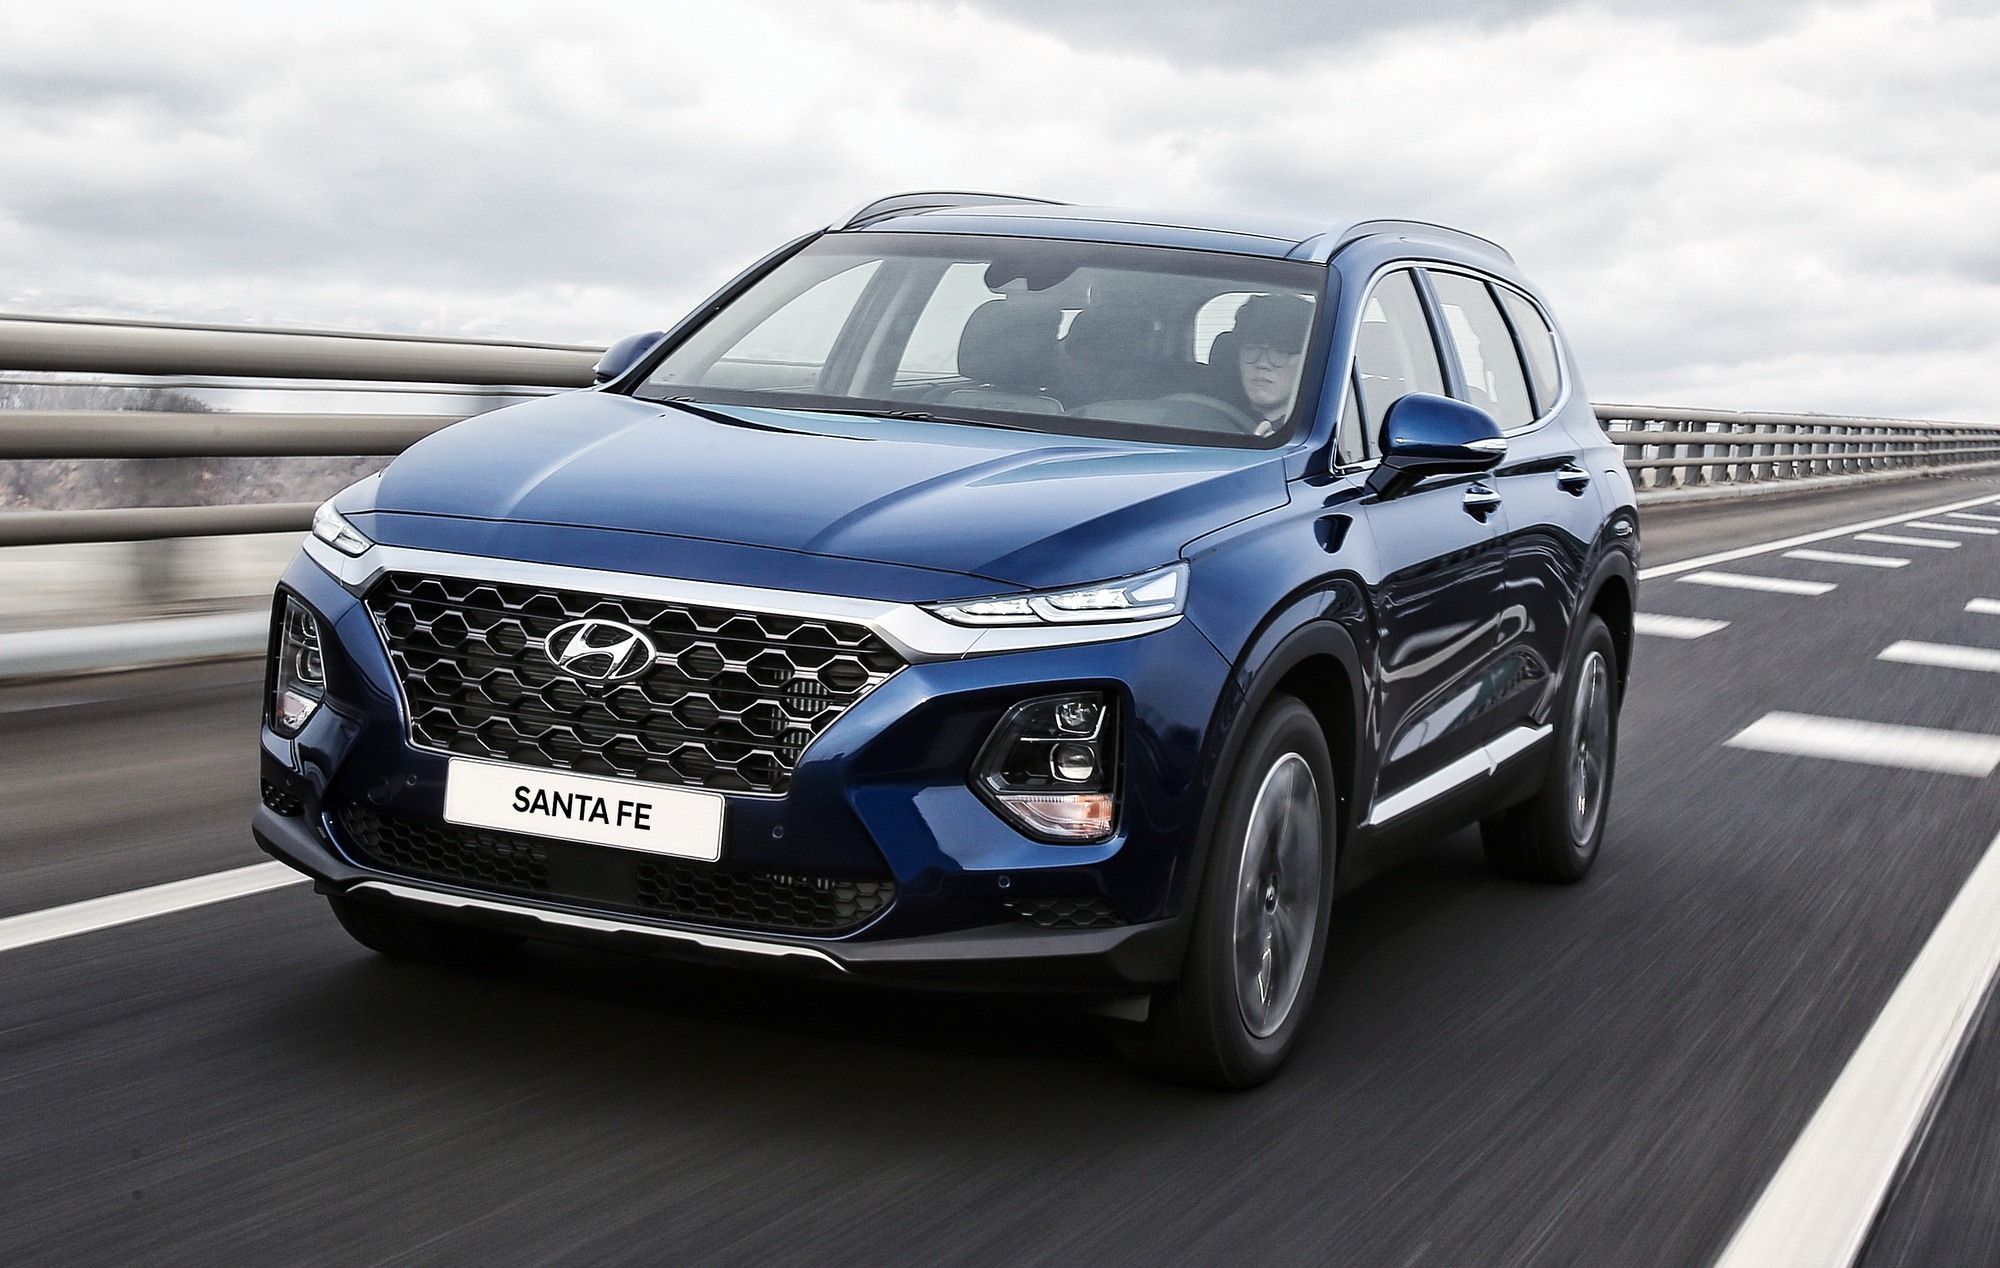 2019 Hyundai Santa Fe Mpg New Release